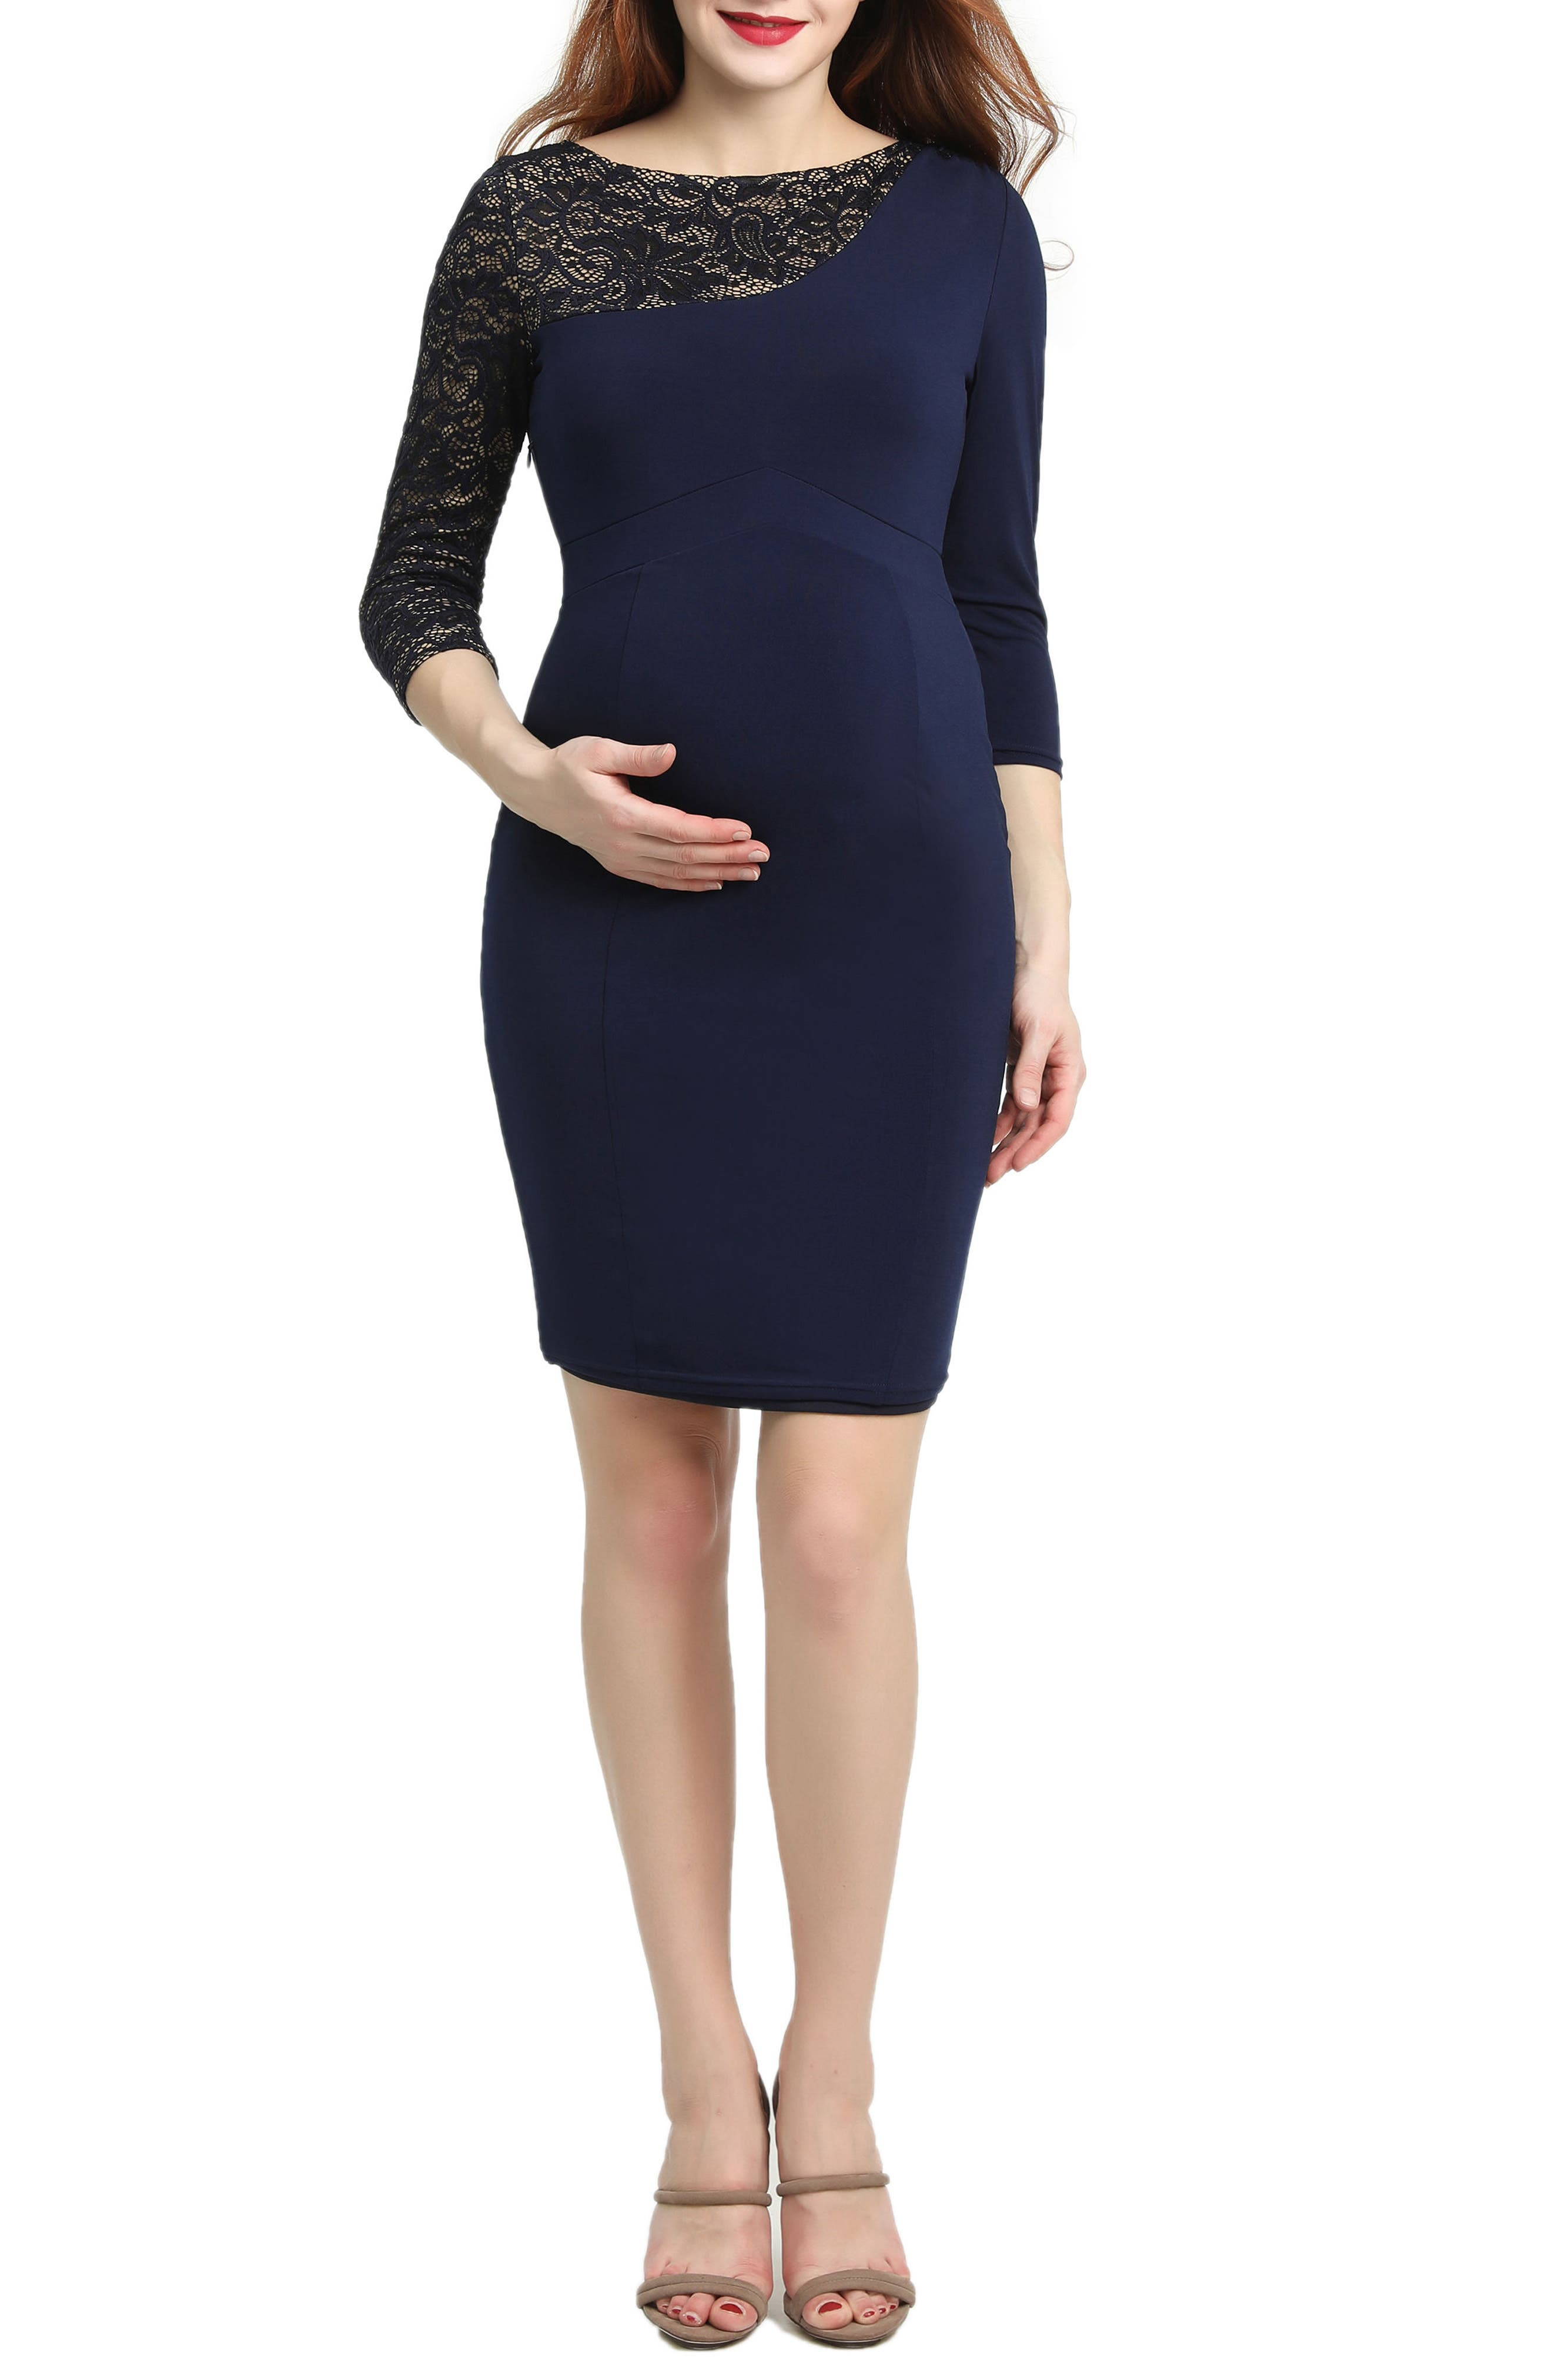 Kimi And Kai Cheyenne Lace Accent Maternity Dress, Blue